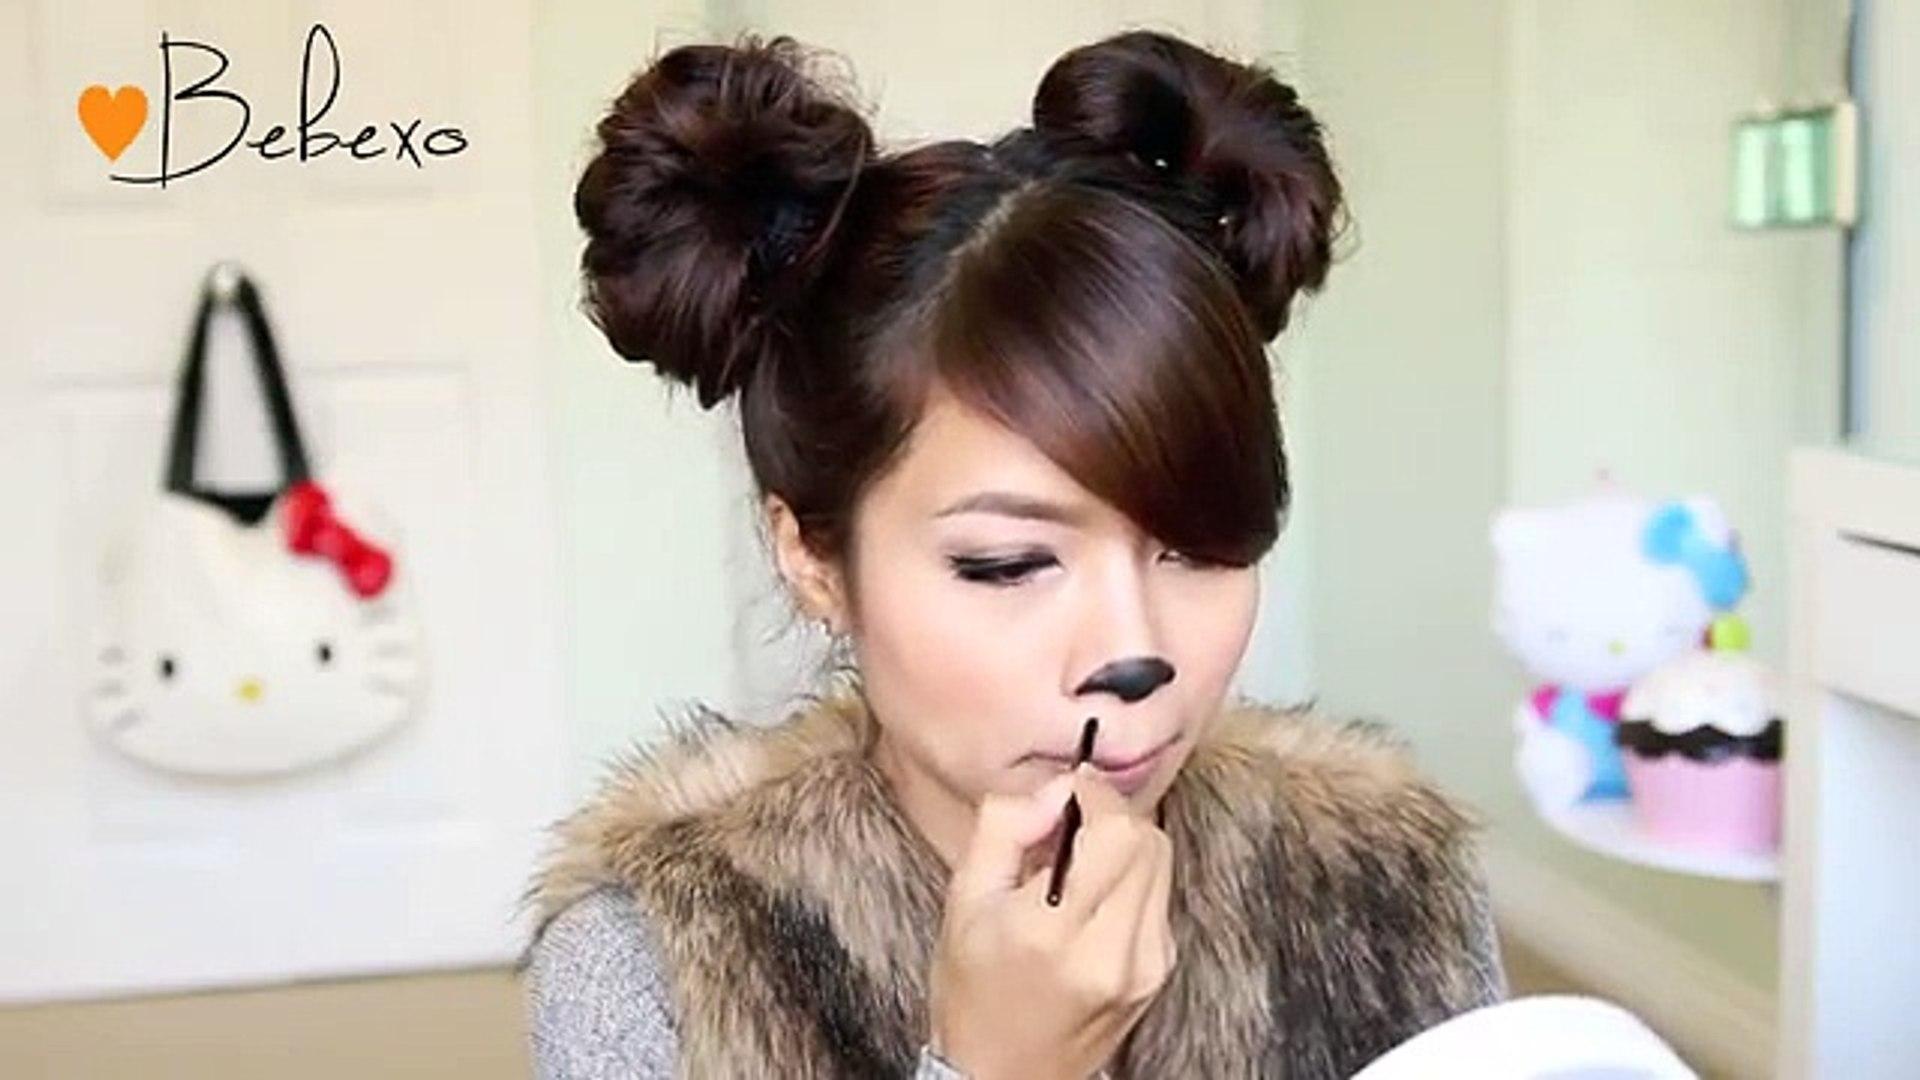 Diy Halloween Costume Ideas Bear Cat Ears Hairstyle Makeup Tutorial